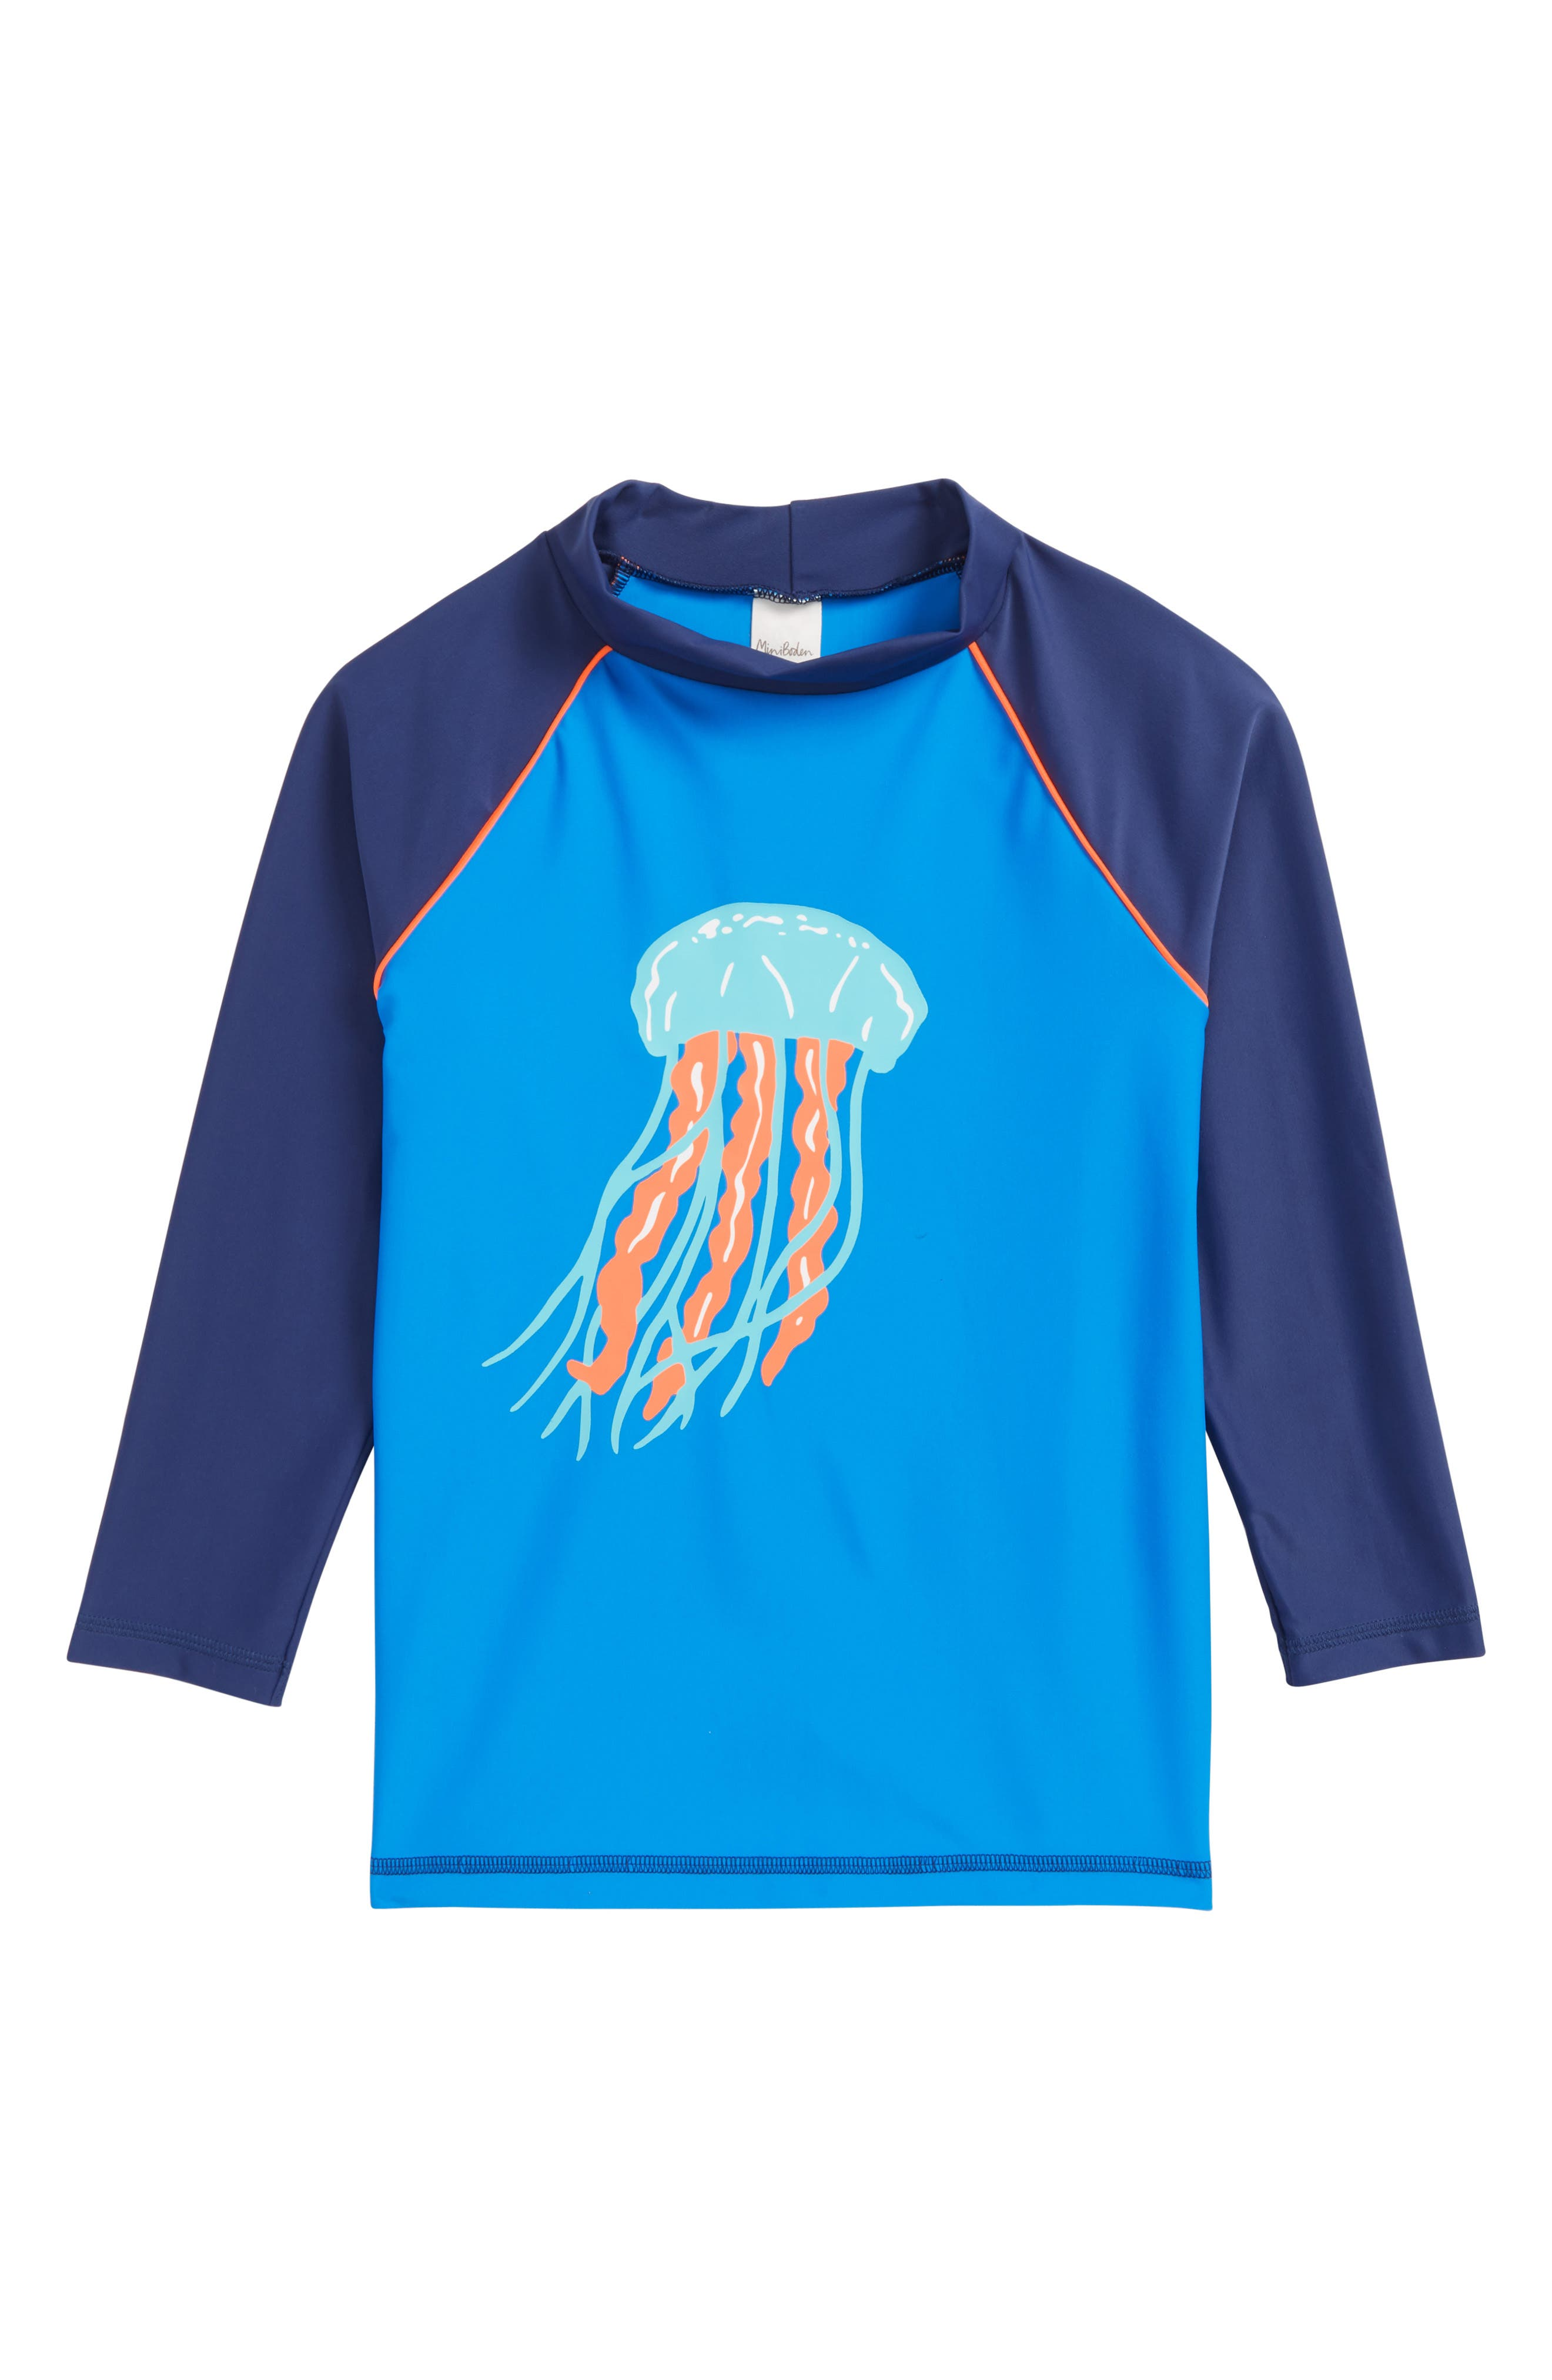 Jellyfish Rashguard,                         Main,                         color, 424